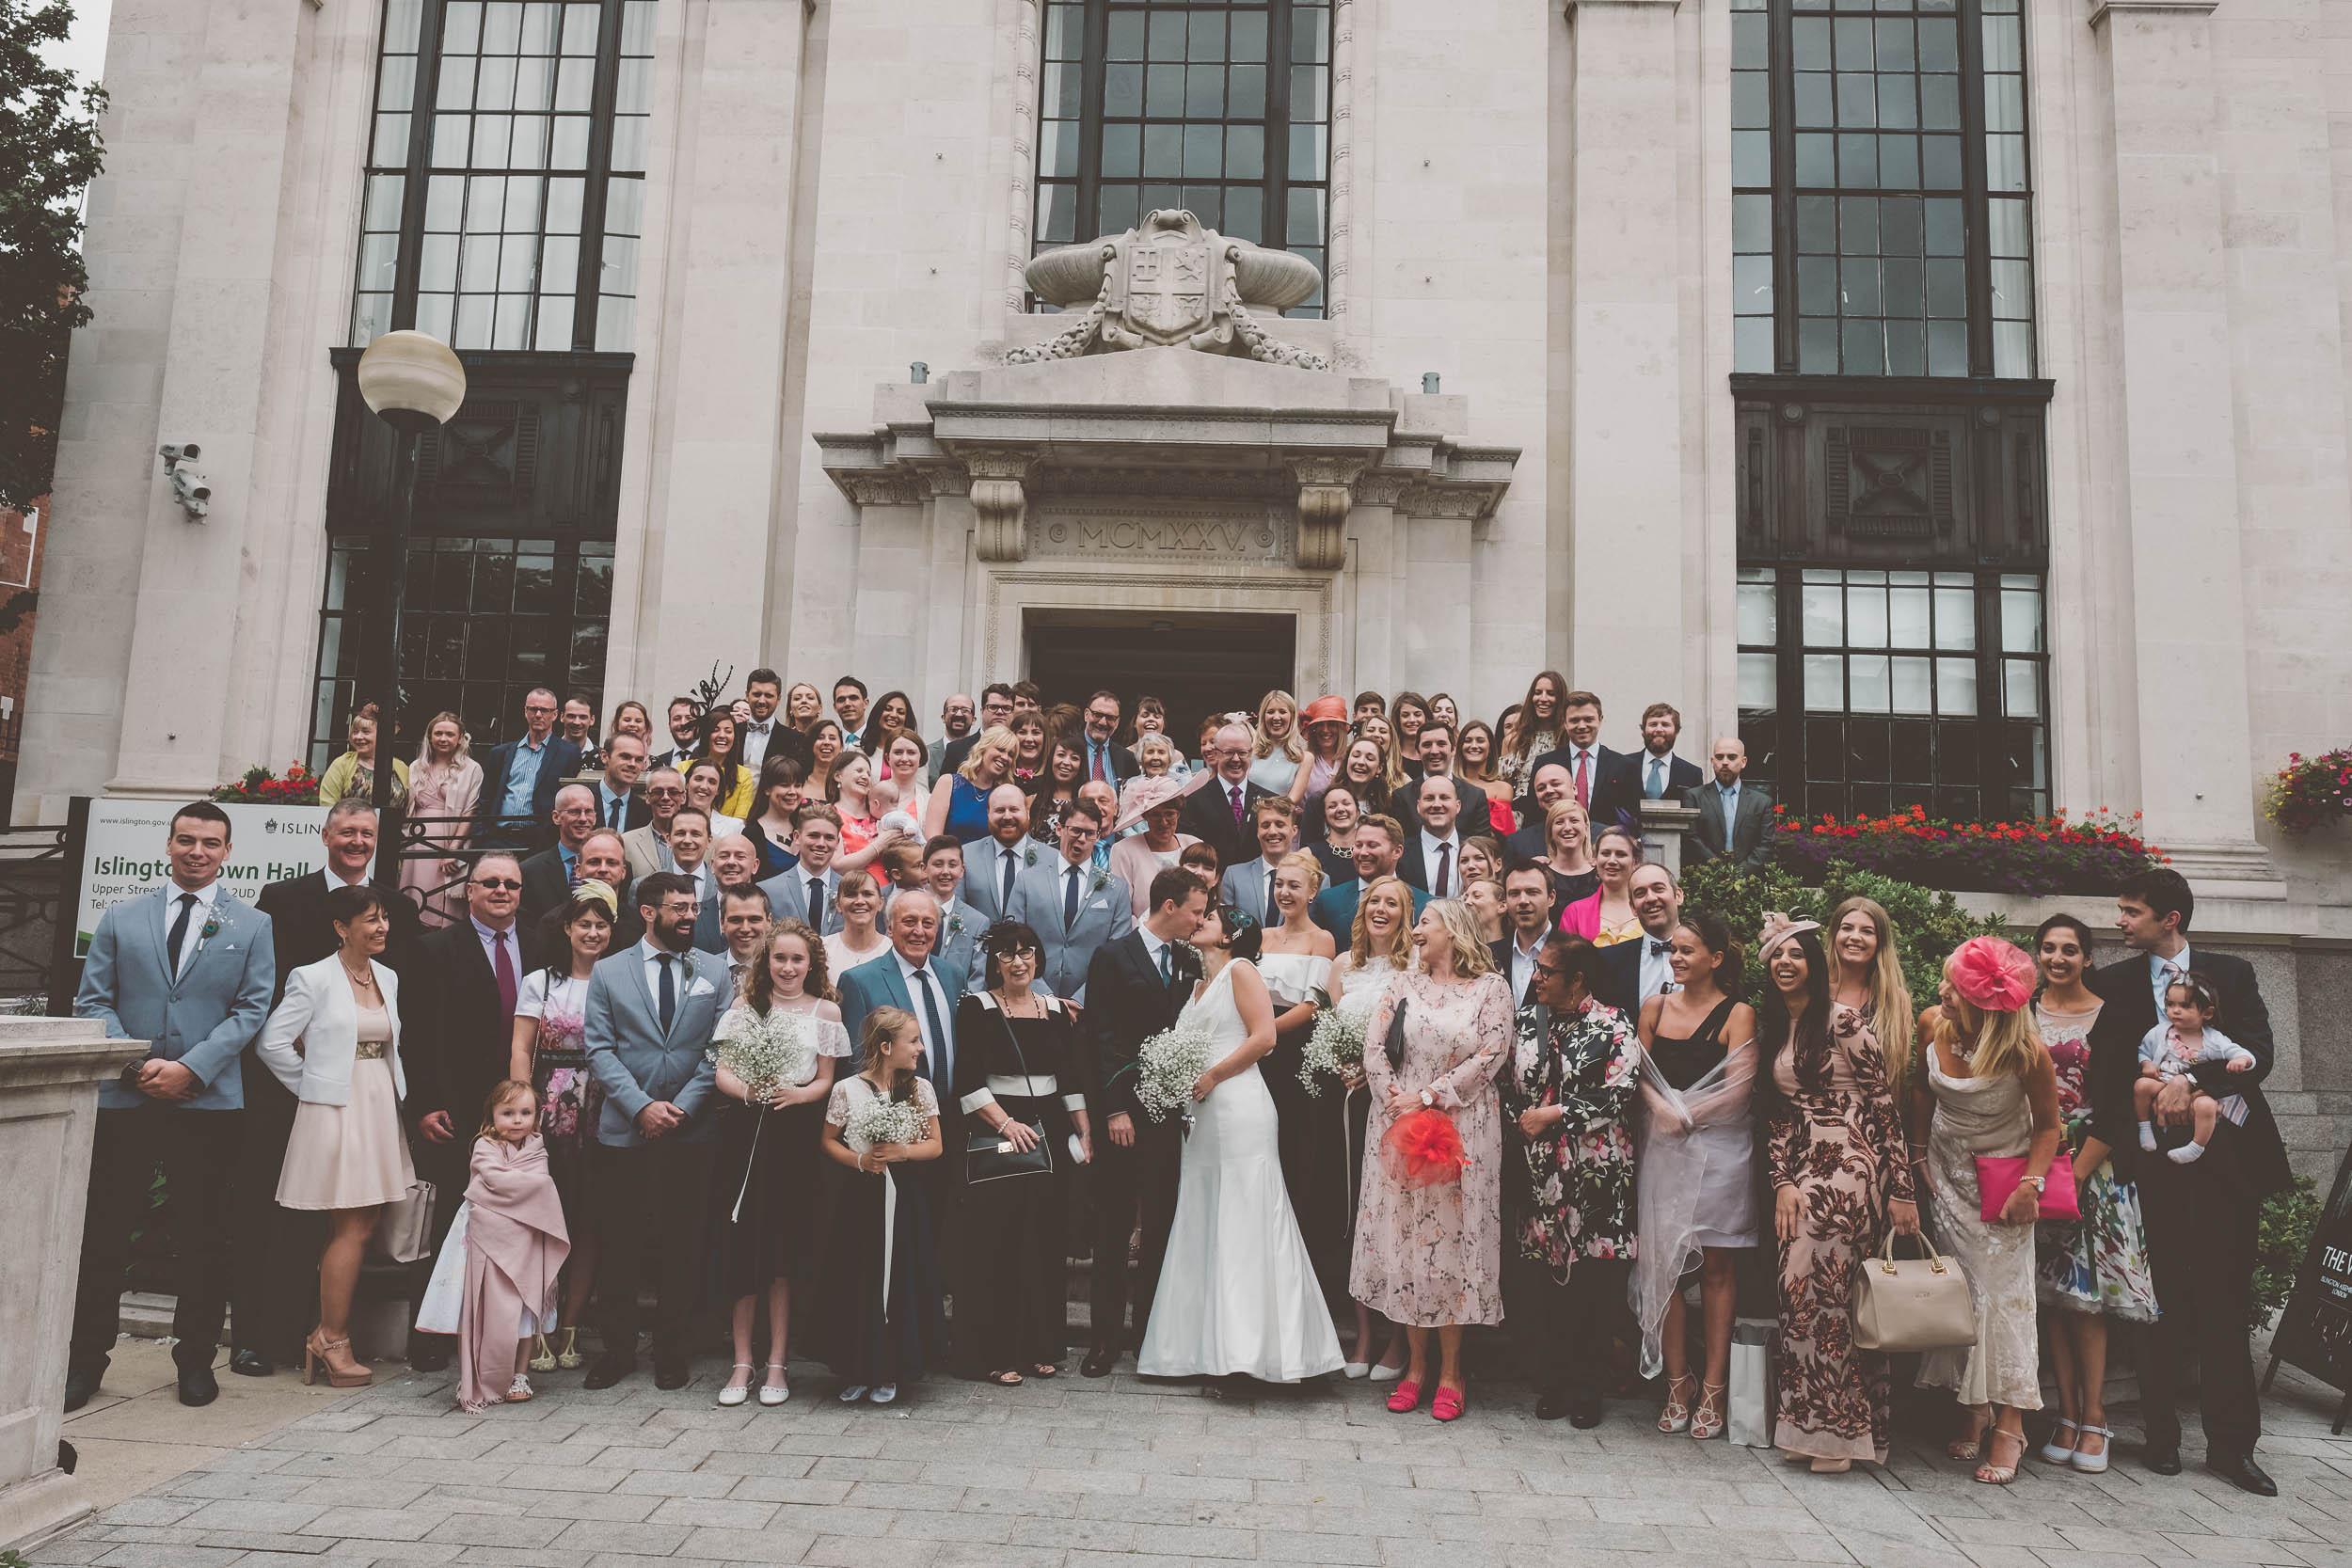 islington-town-hall-4th-floor-studios-wedding169.jpg